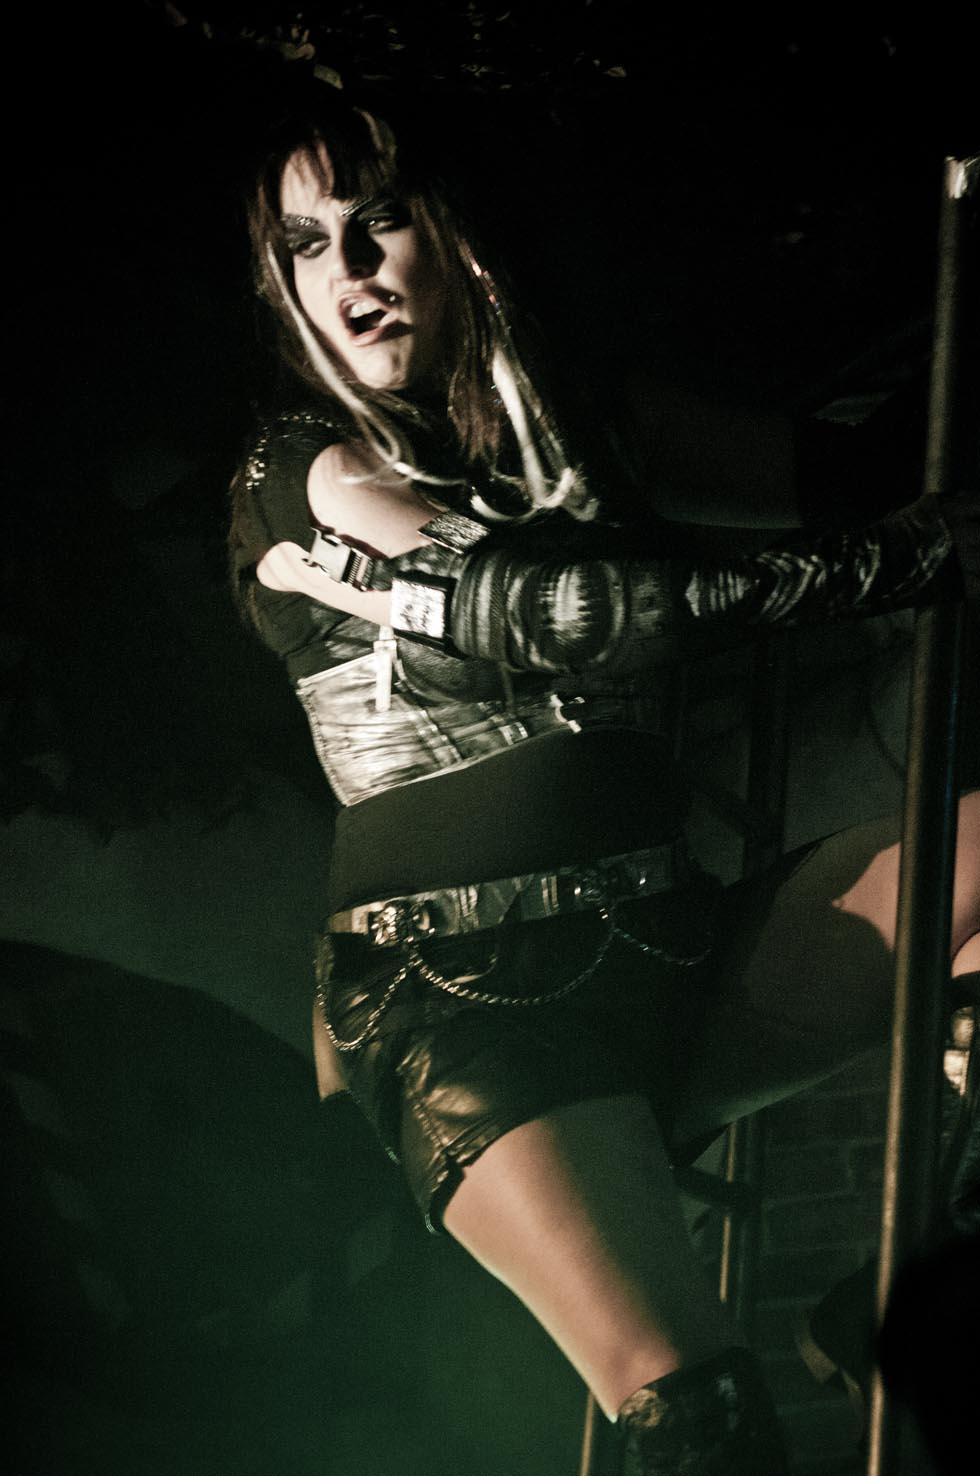 zum-schneider-nyc-2012-karneval-apocalyptika-5091.jpg